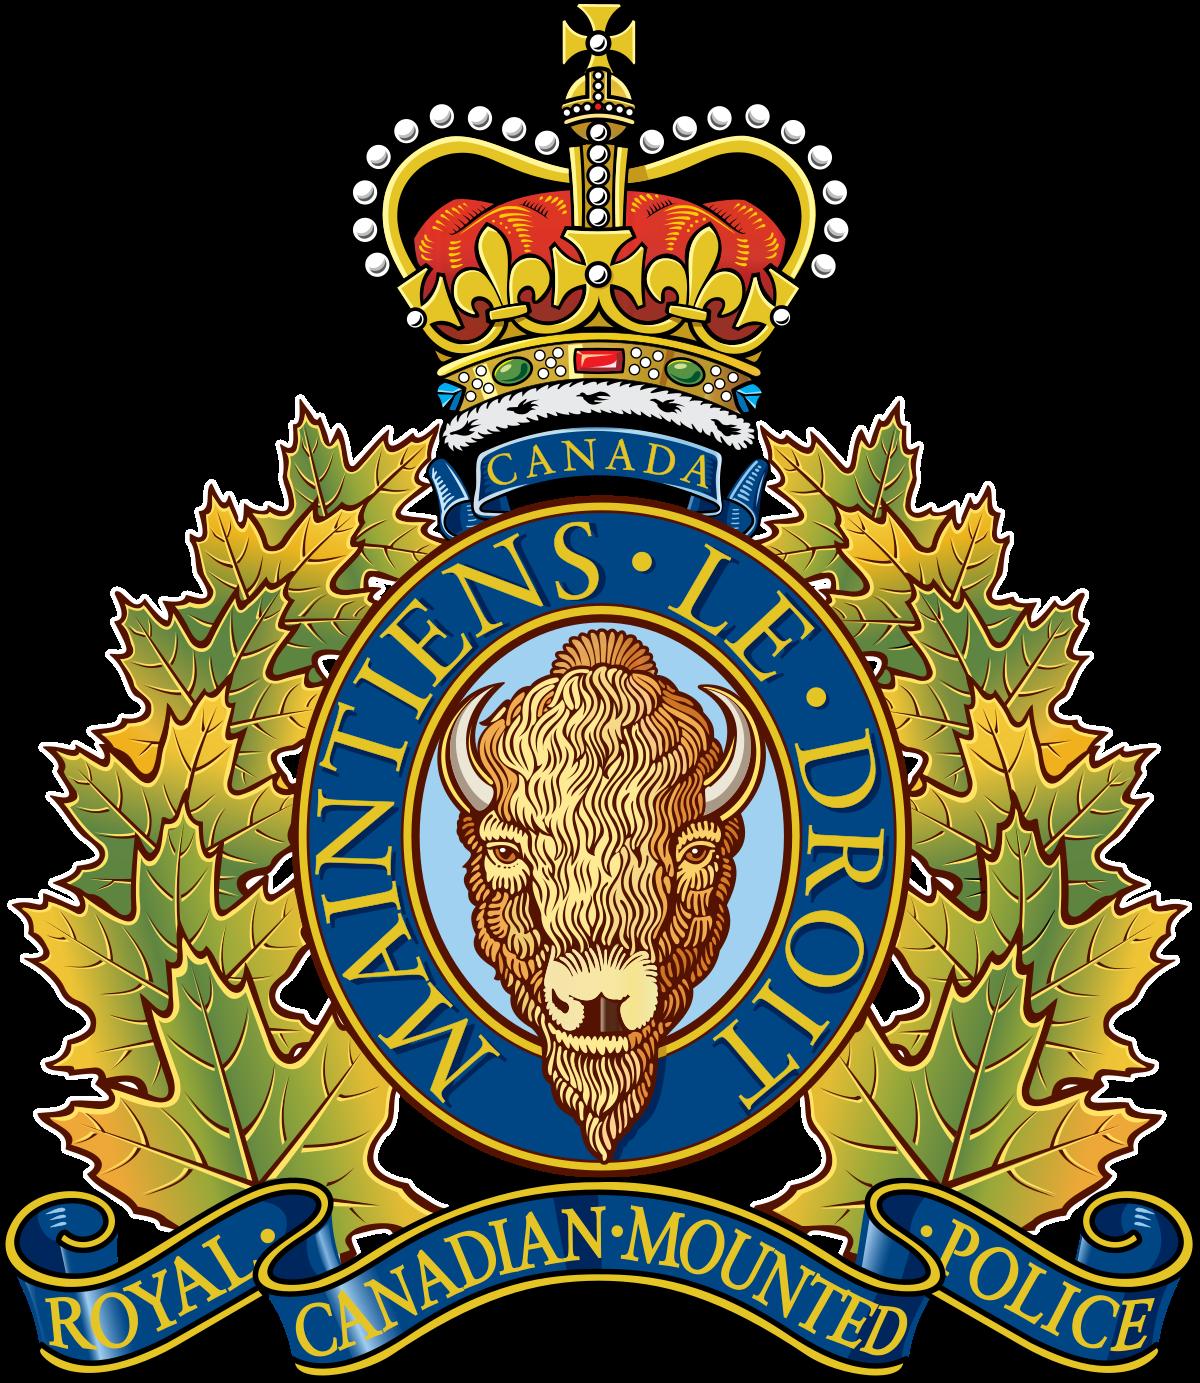 Man with East Kootenay ties identified as victim in murder investigation